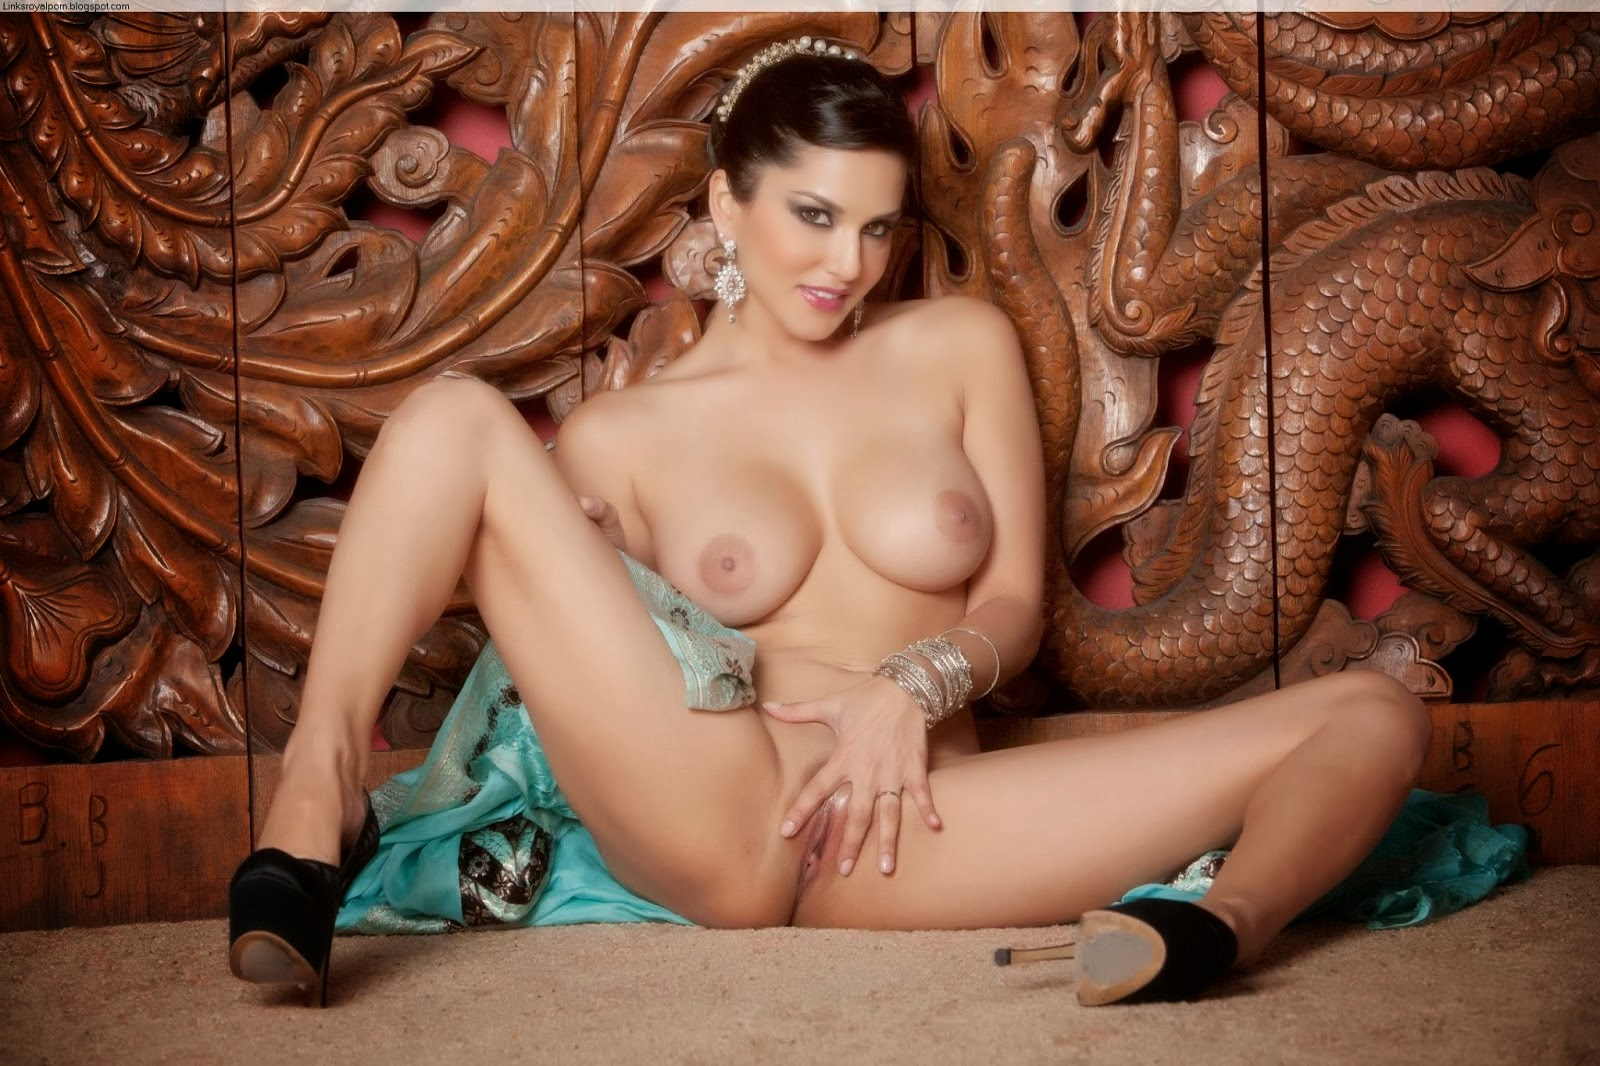 S ex phots naked hot xxx film